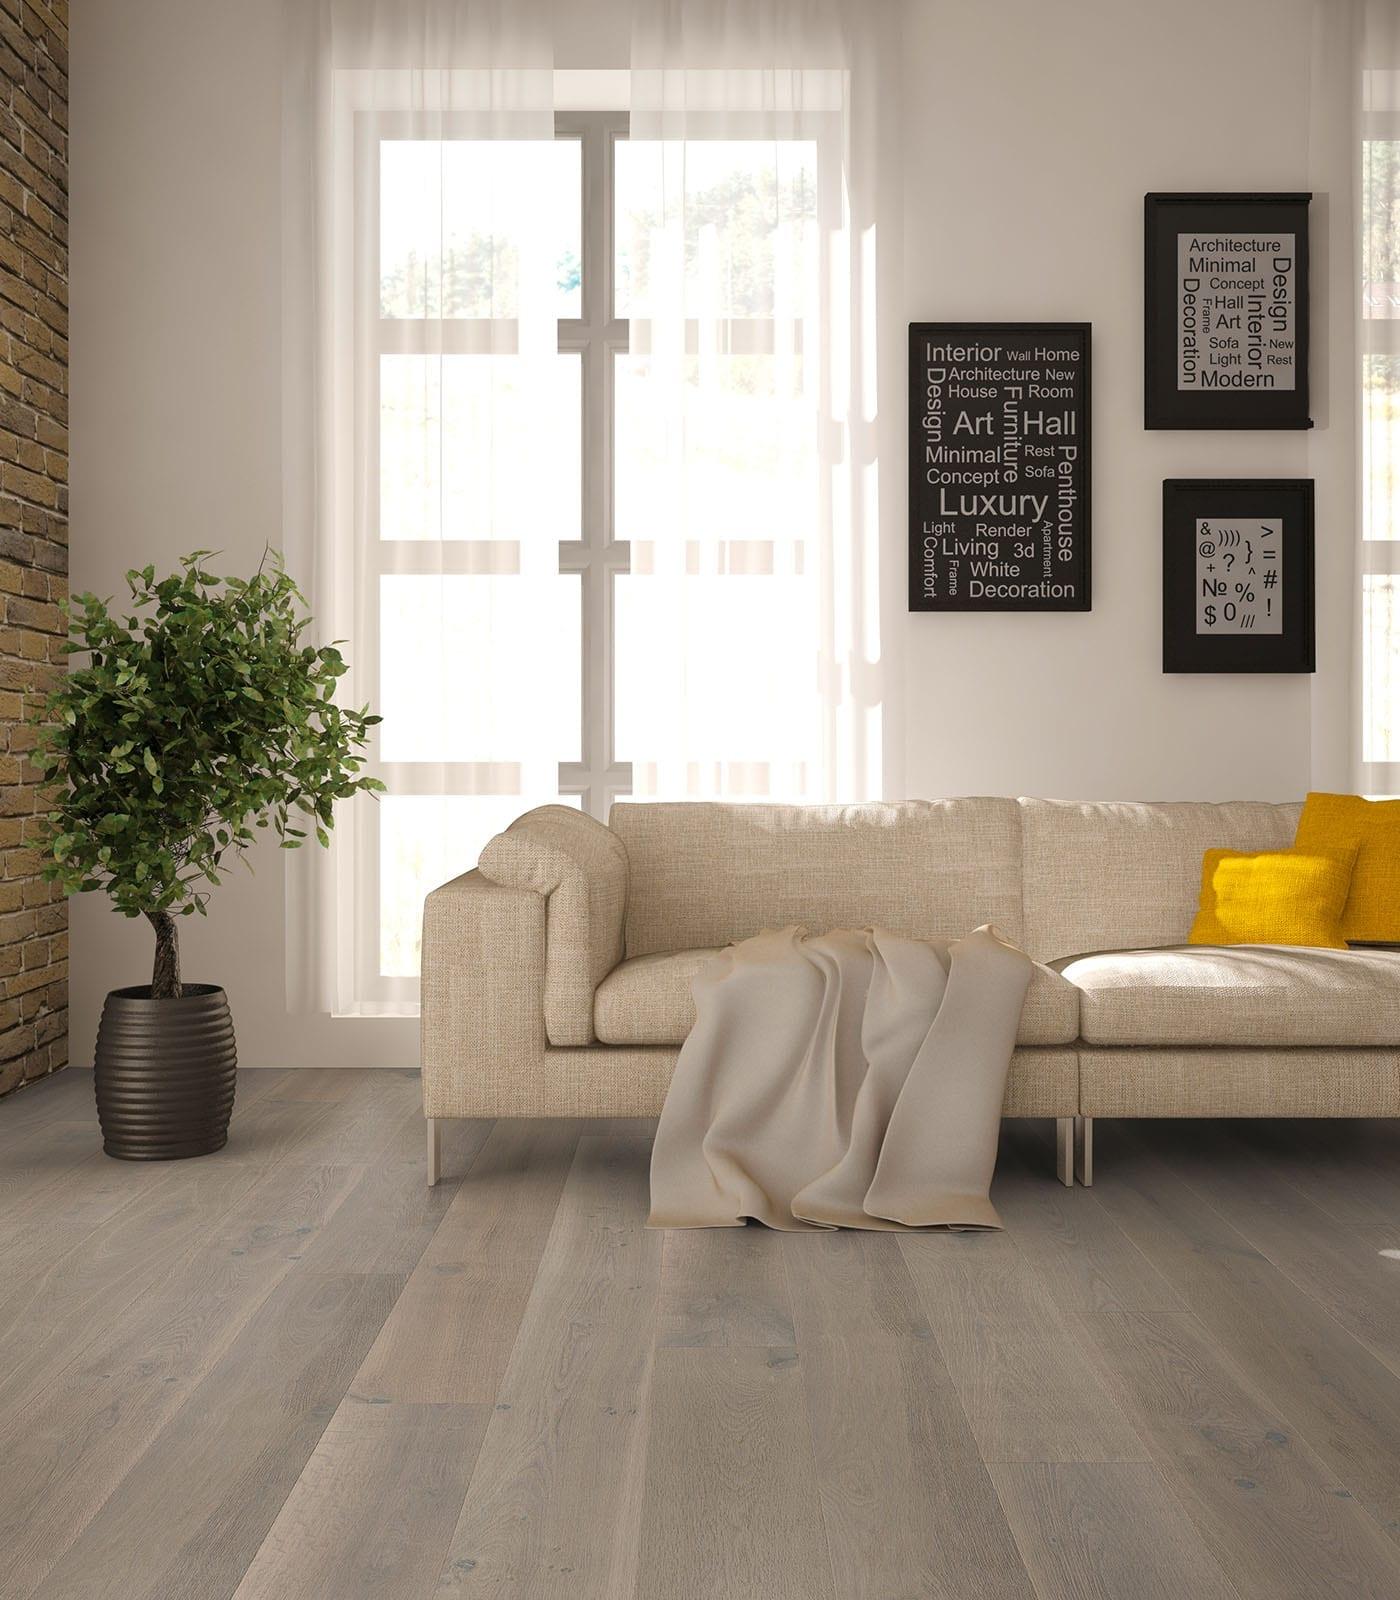 Seychelles-Lifestyle Collection-European Oak Floors-room